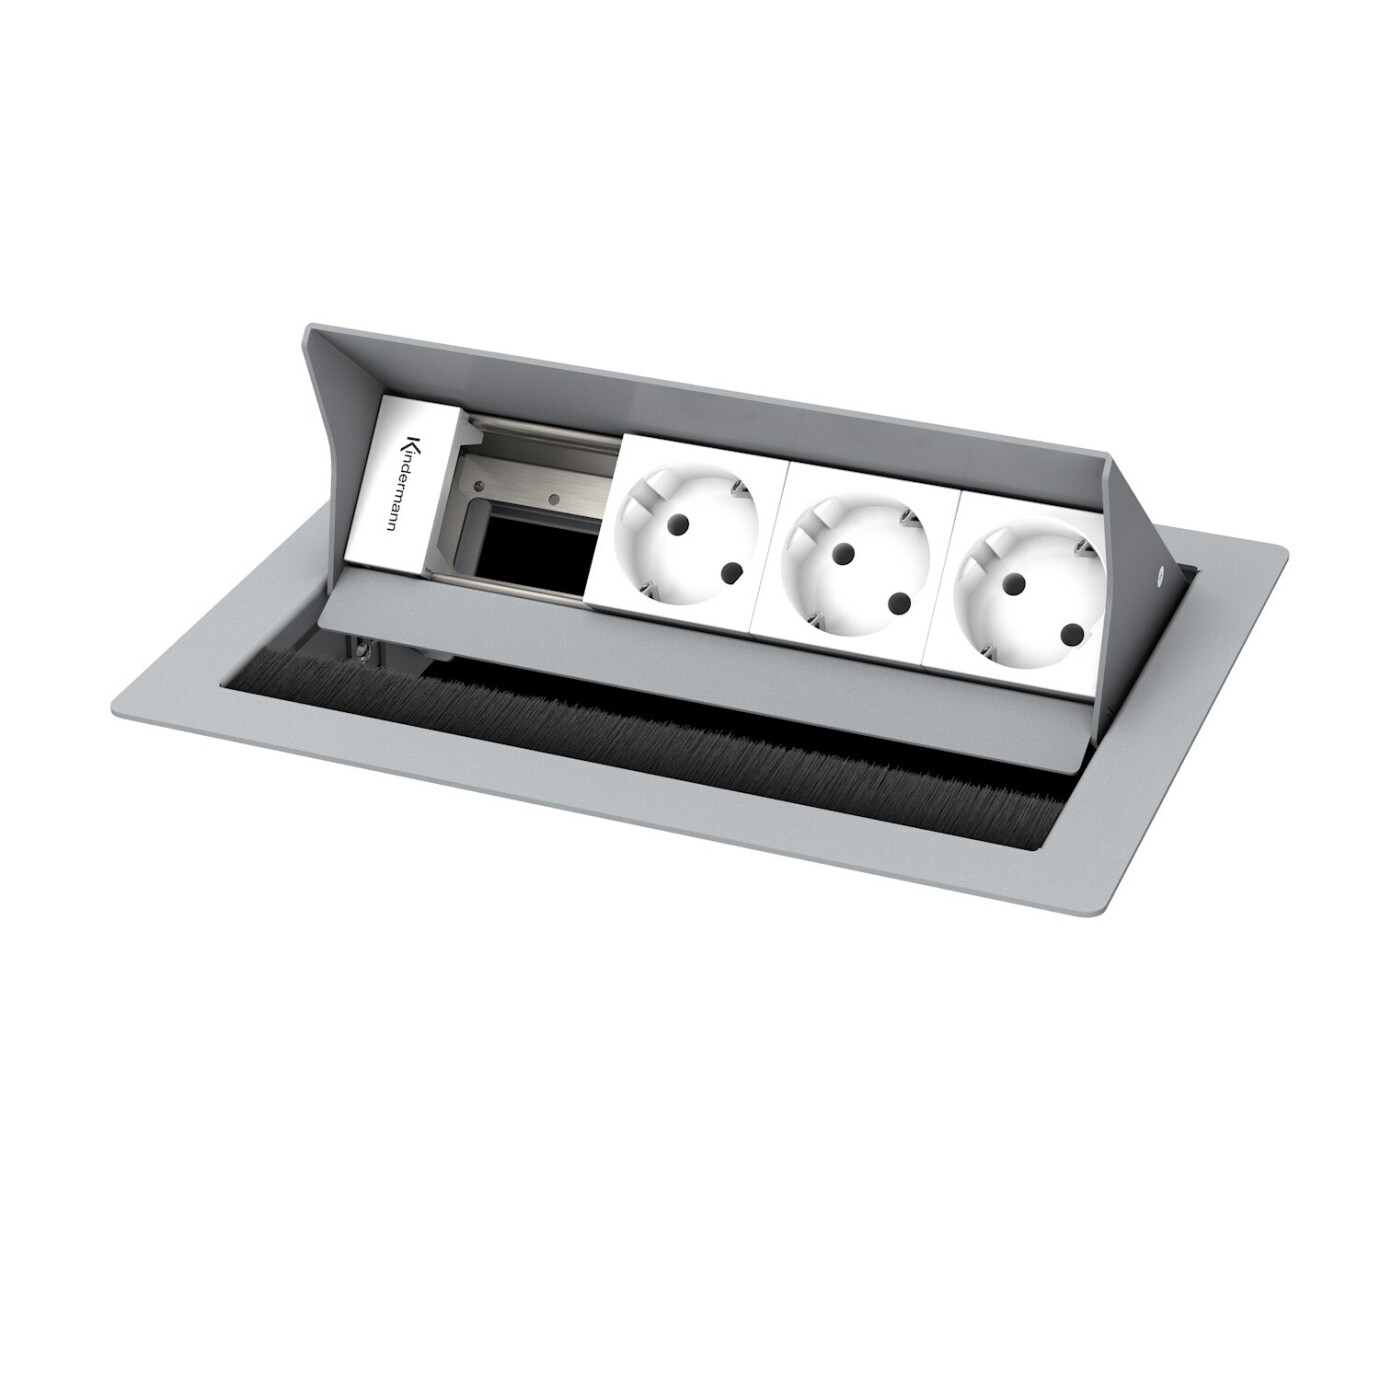 Kindermann CablePort standard2 4-fach, 3 x Strom